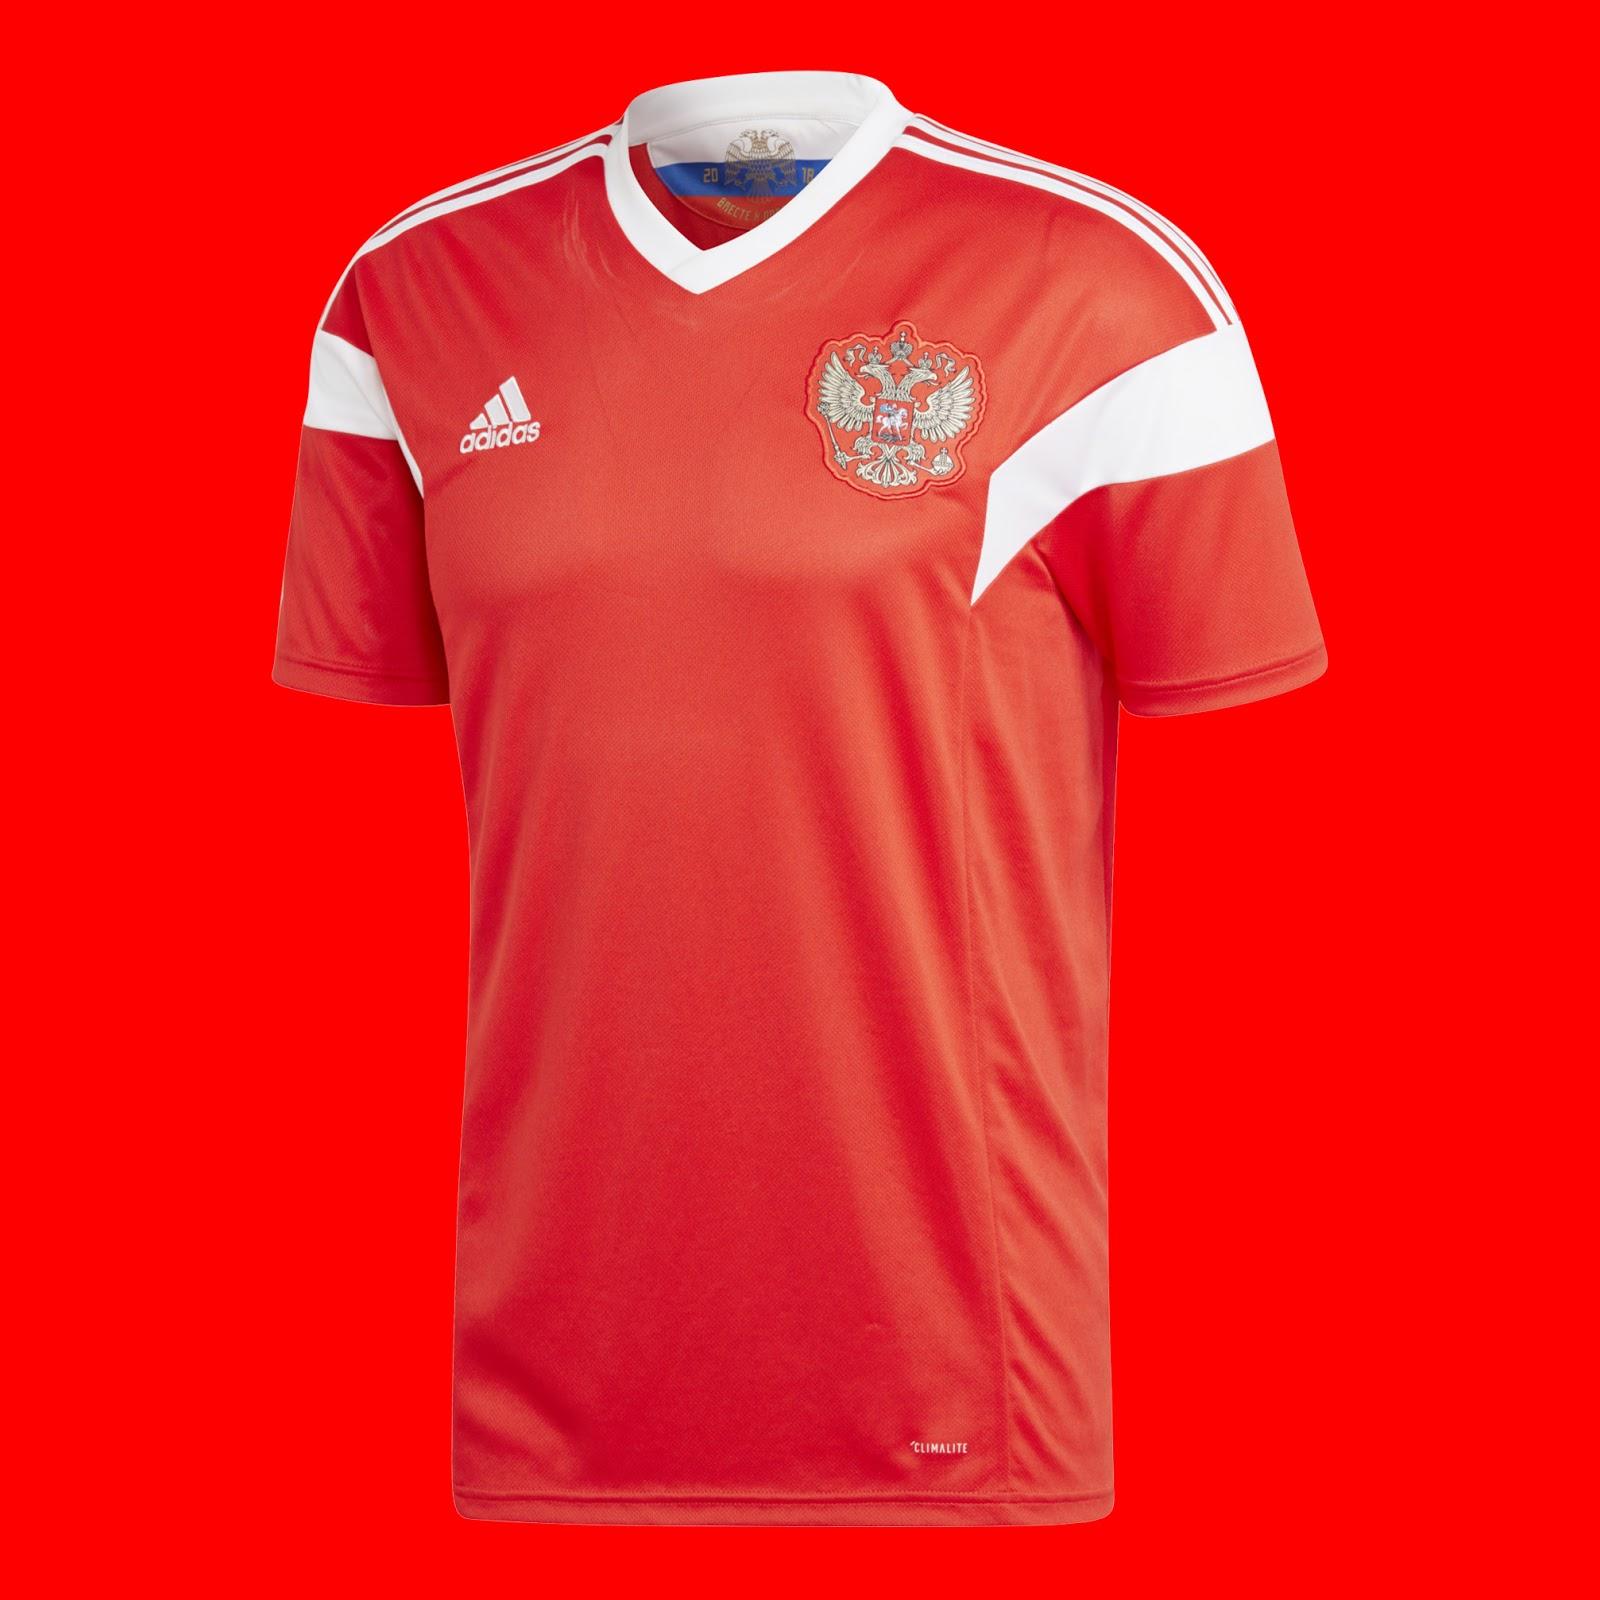 d1b80b4982cd russia world cup jersey 2018